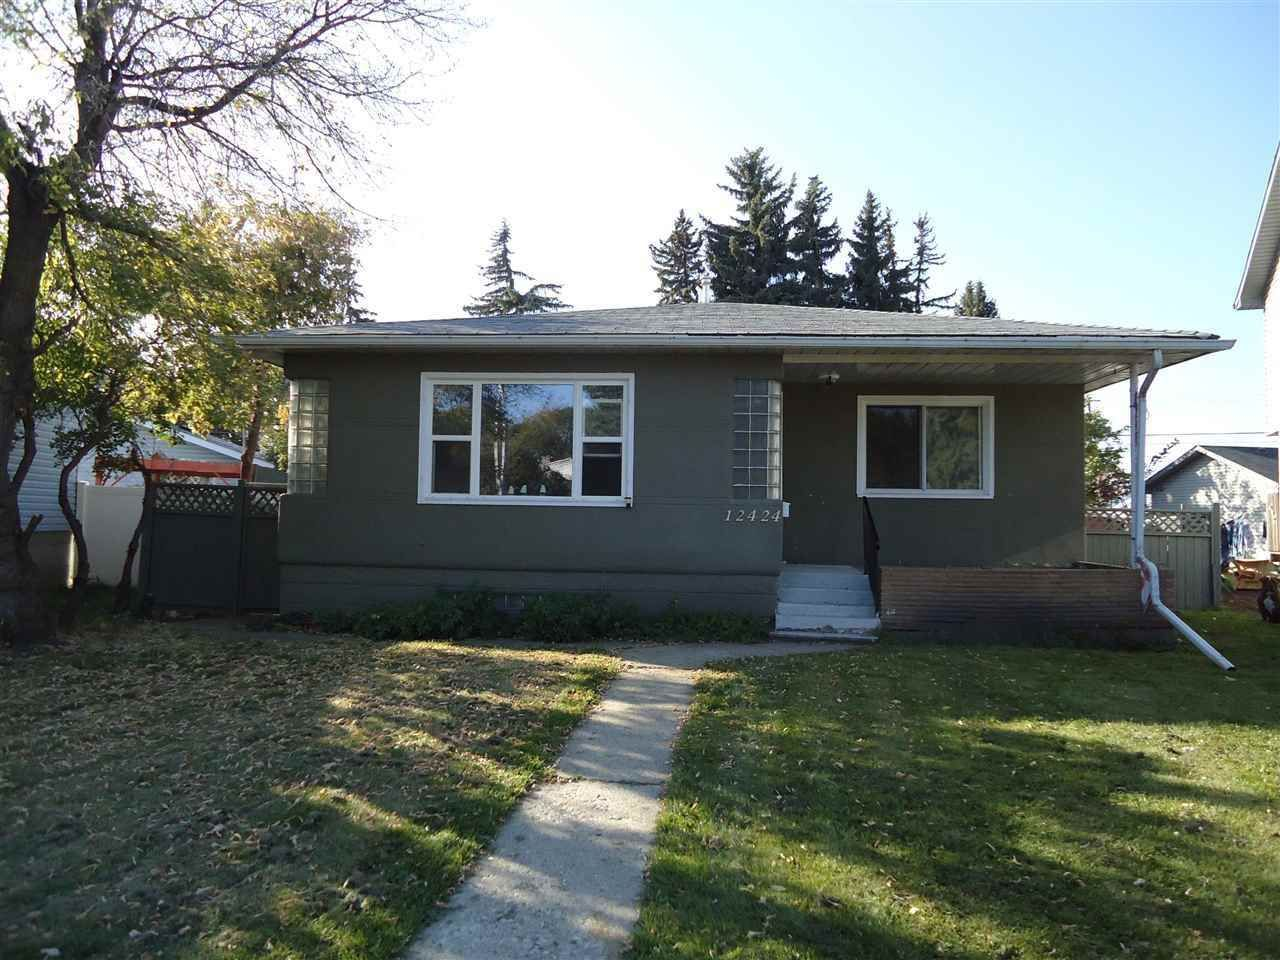 Main Photo:  in Edmonton: Zone 05 House for sale : MLS®# E4242916